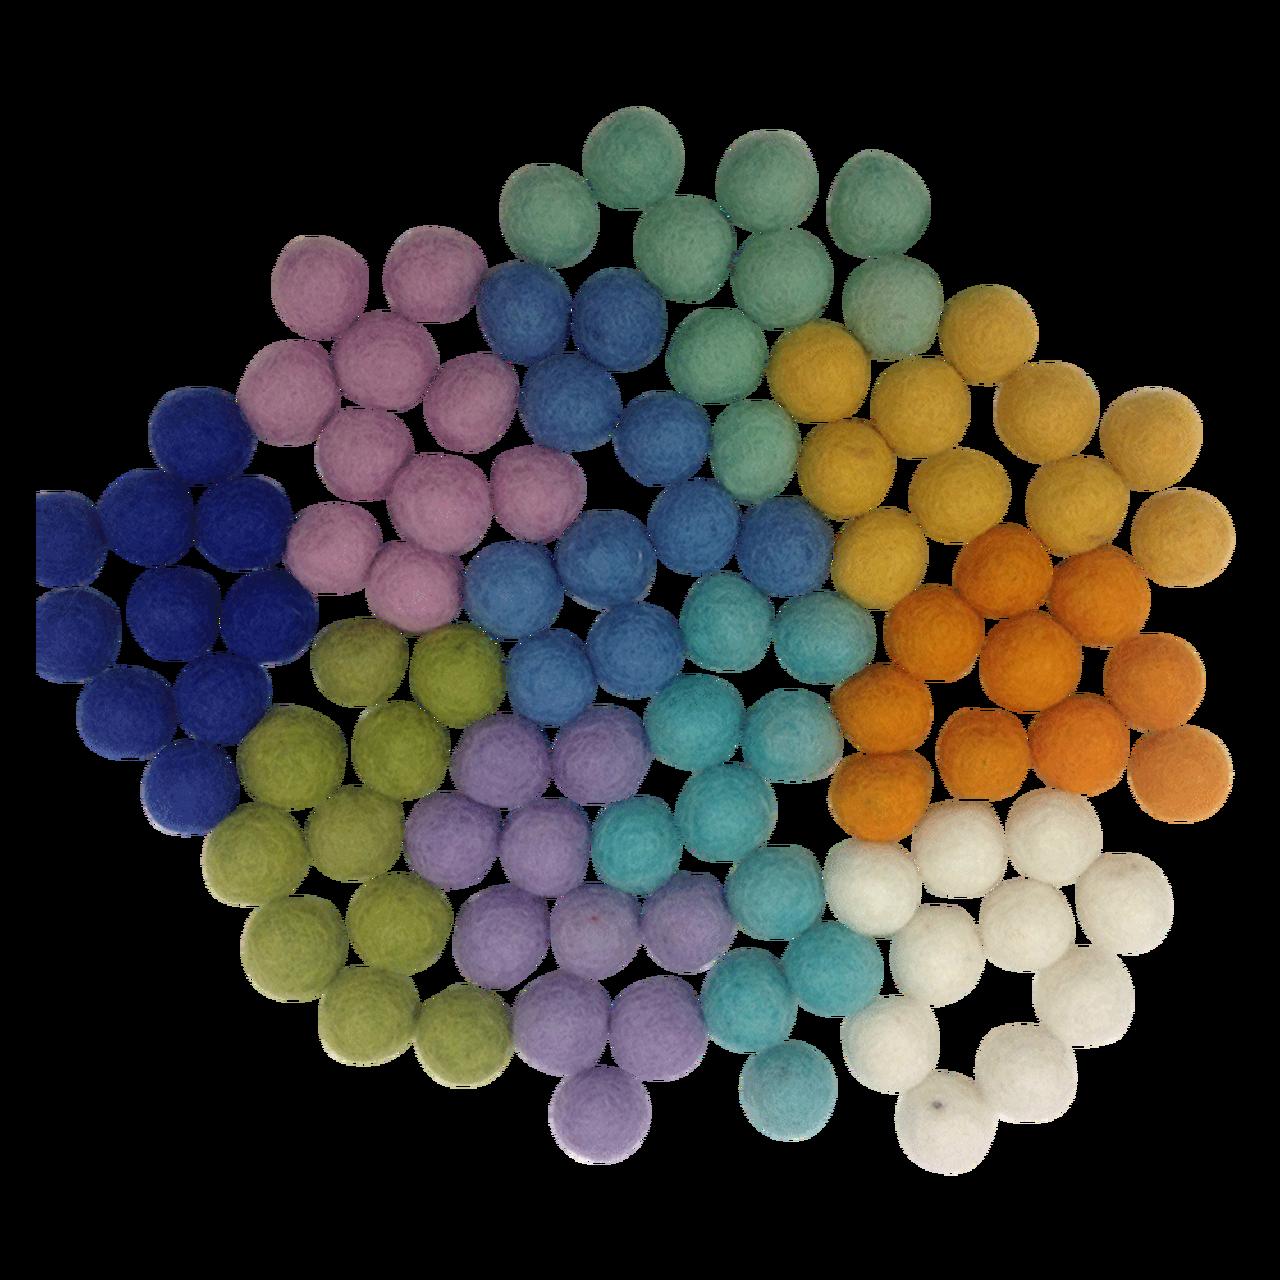 Primavera Conjunto Sensorial Pompons de Lã | Bosque Feliz